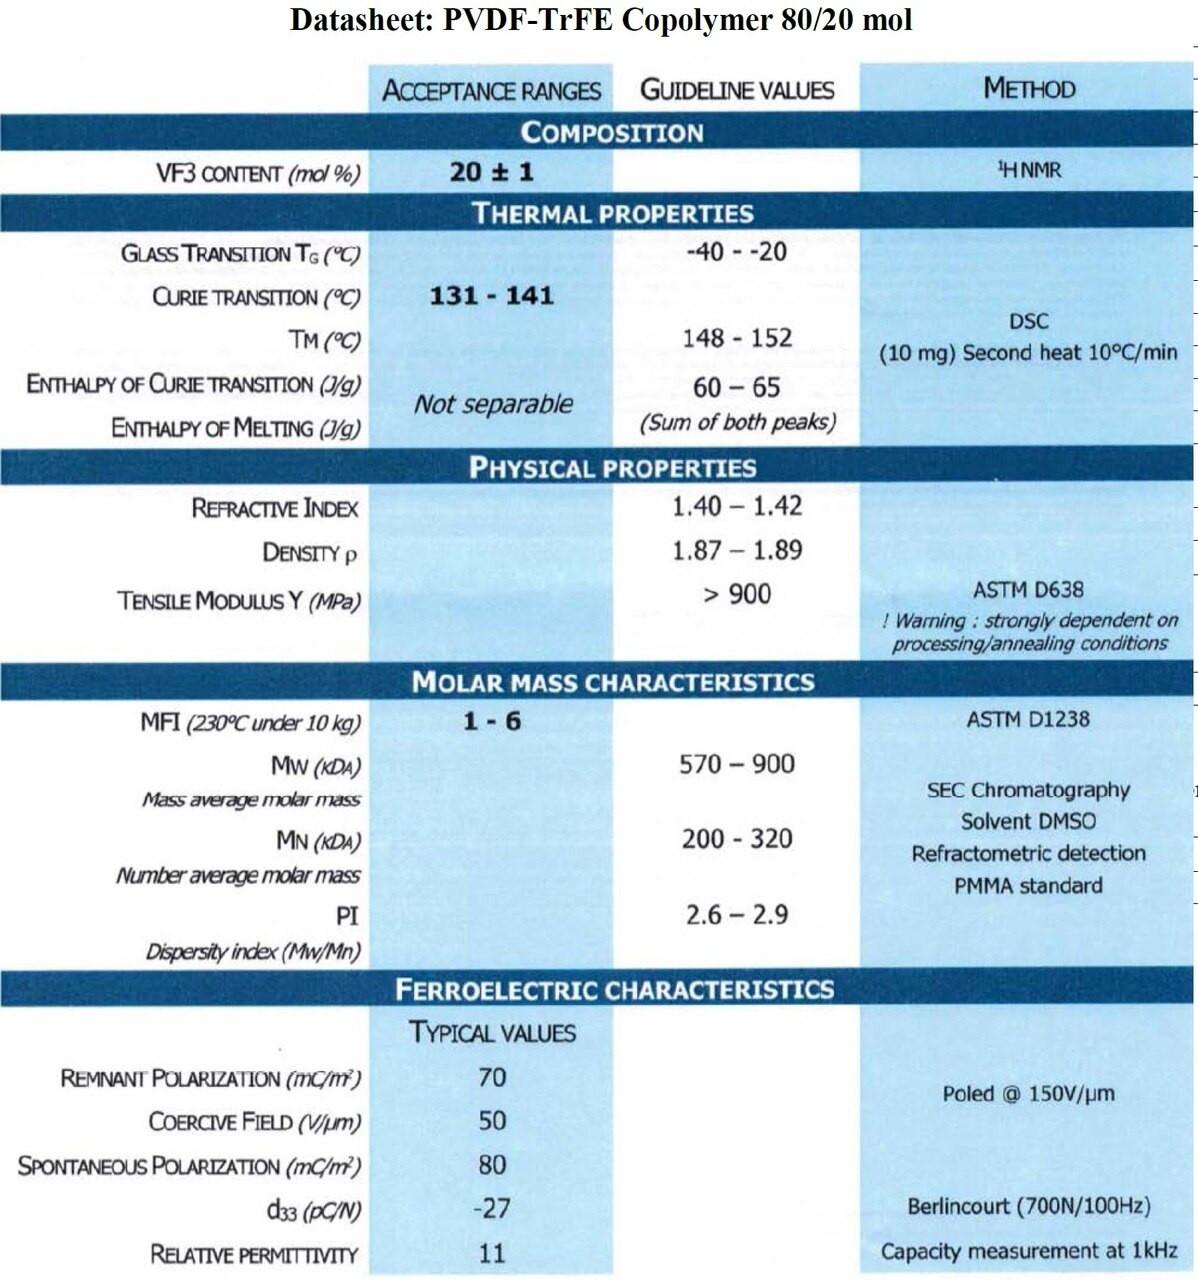 Piezotech P(VDF-TrFE) Copolymer Resin 100 gram, 70/30 mol to 80/20 mol